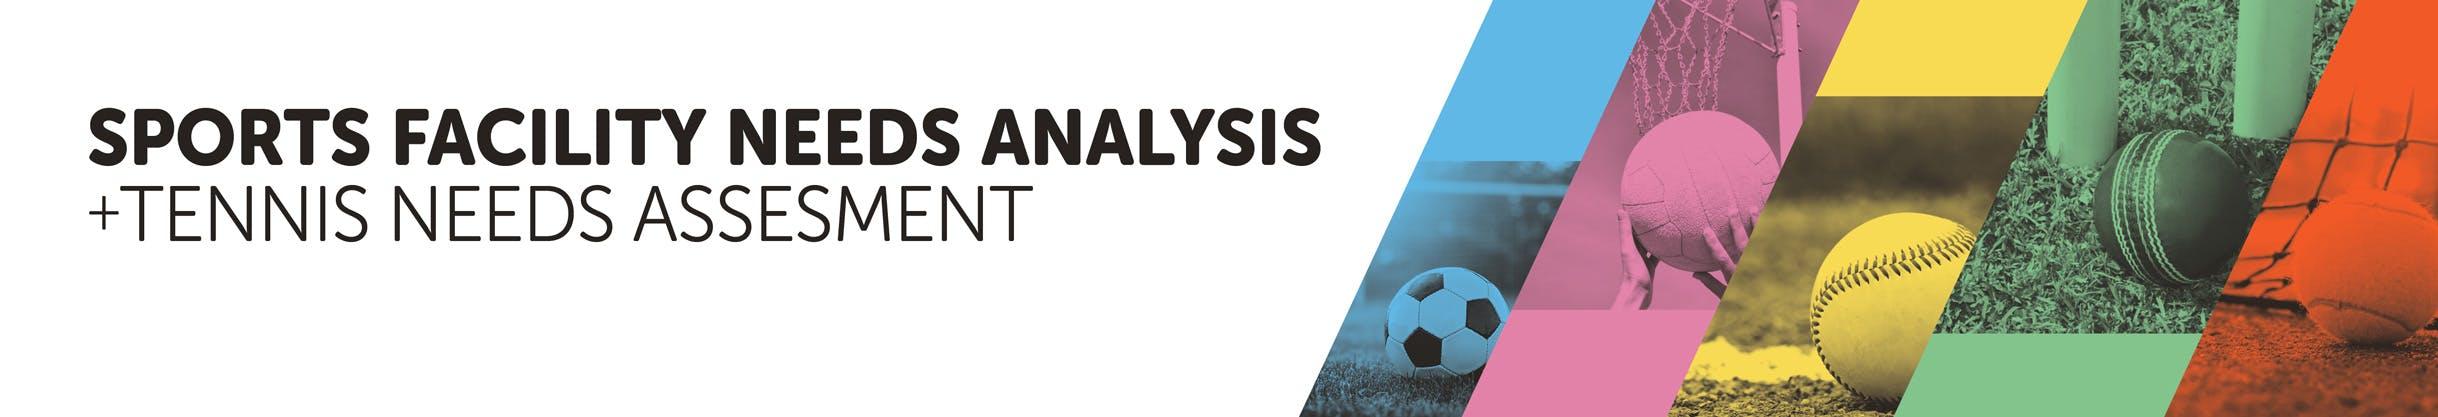 Sports Facility Needs Analysis + Tennis Needs Assessment